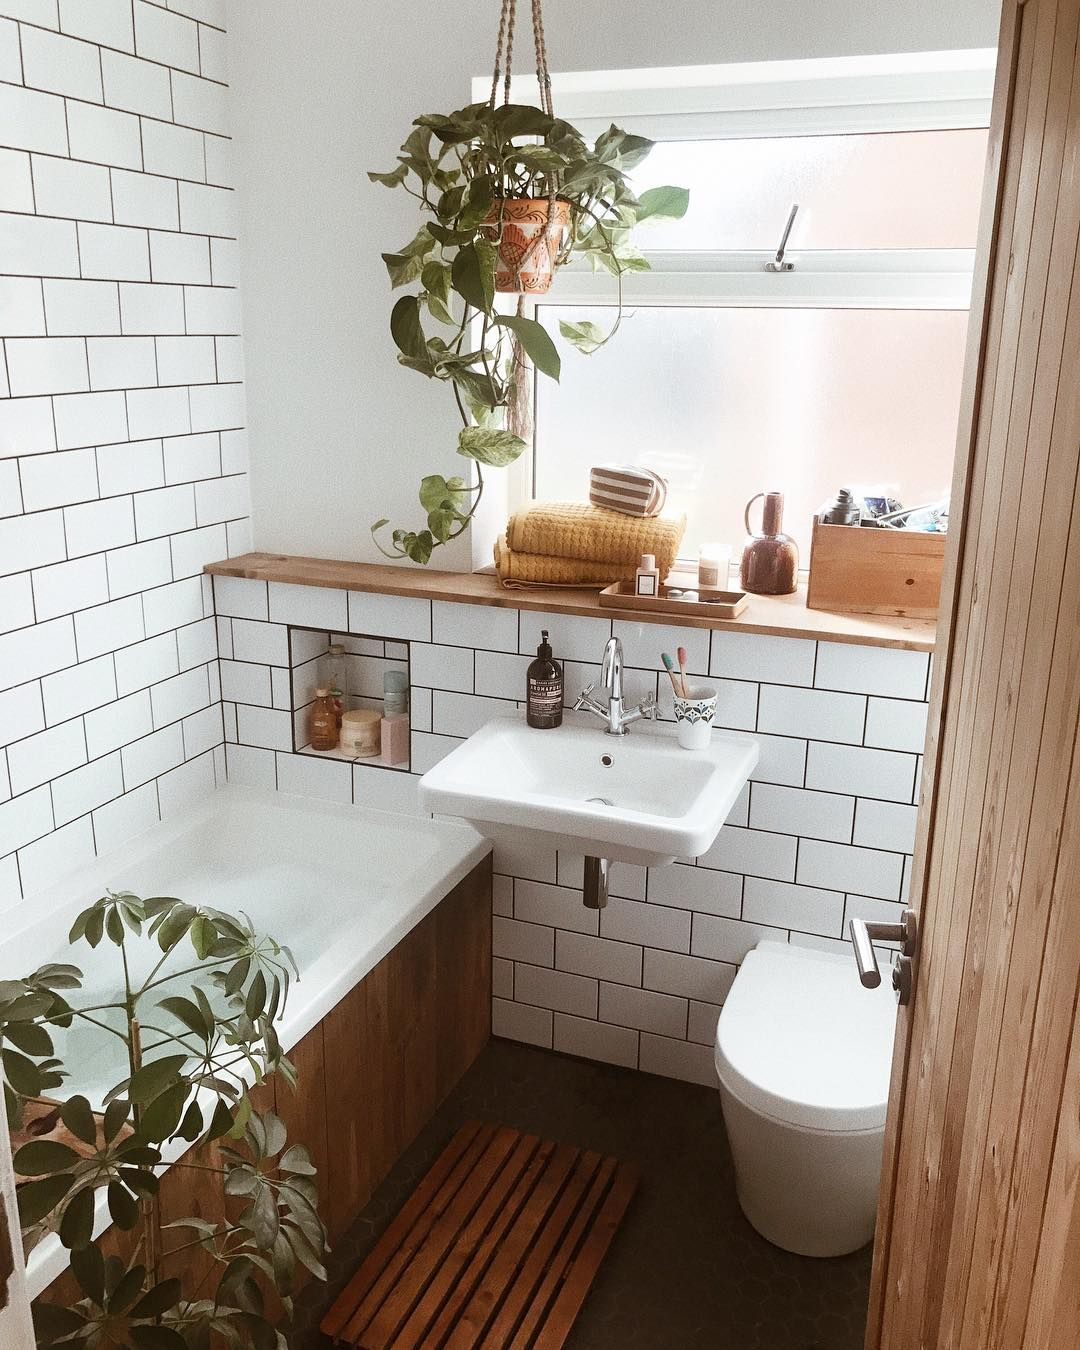 Small Bathroom Ideas Subway Tiles Houseplants Wooden Bath Panel Minimalist Small Bathrooms Wooden Bath Panel Bathroom Inspiration